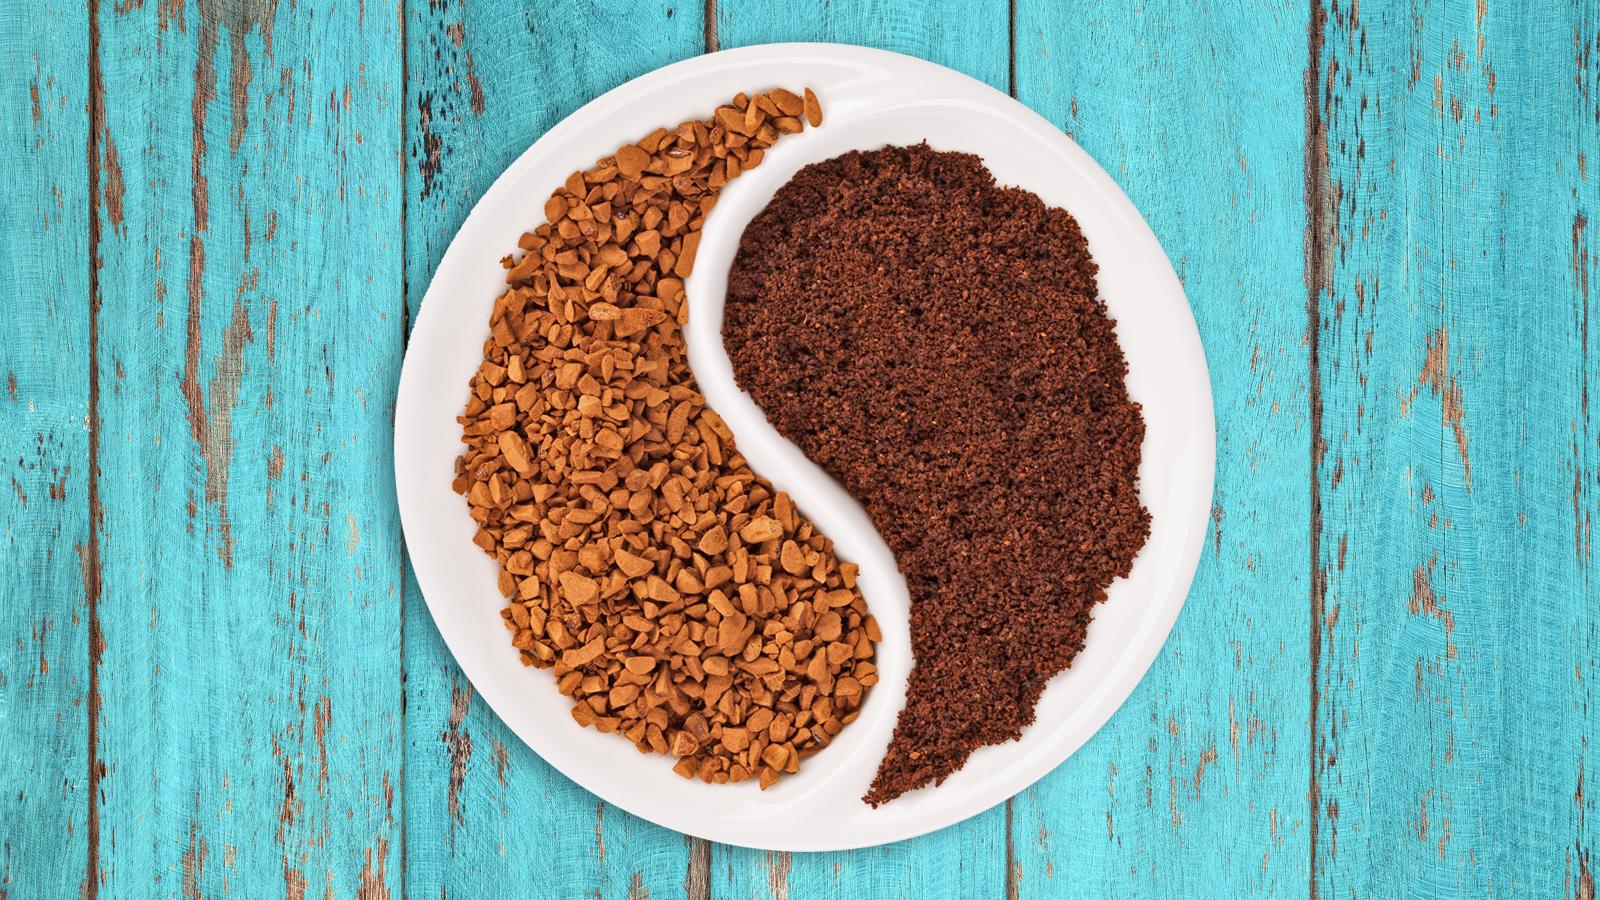 Instant coffee vs. ground coffee